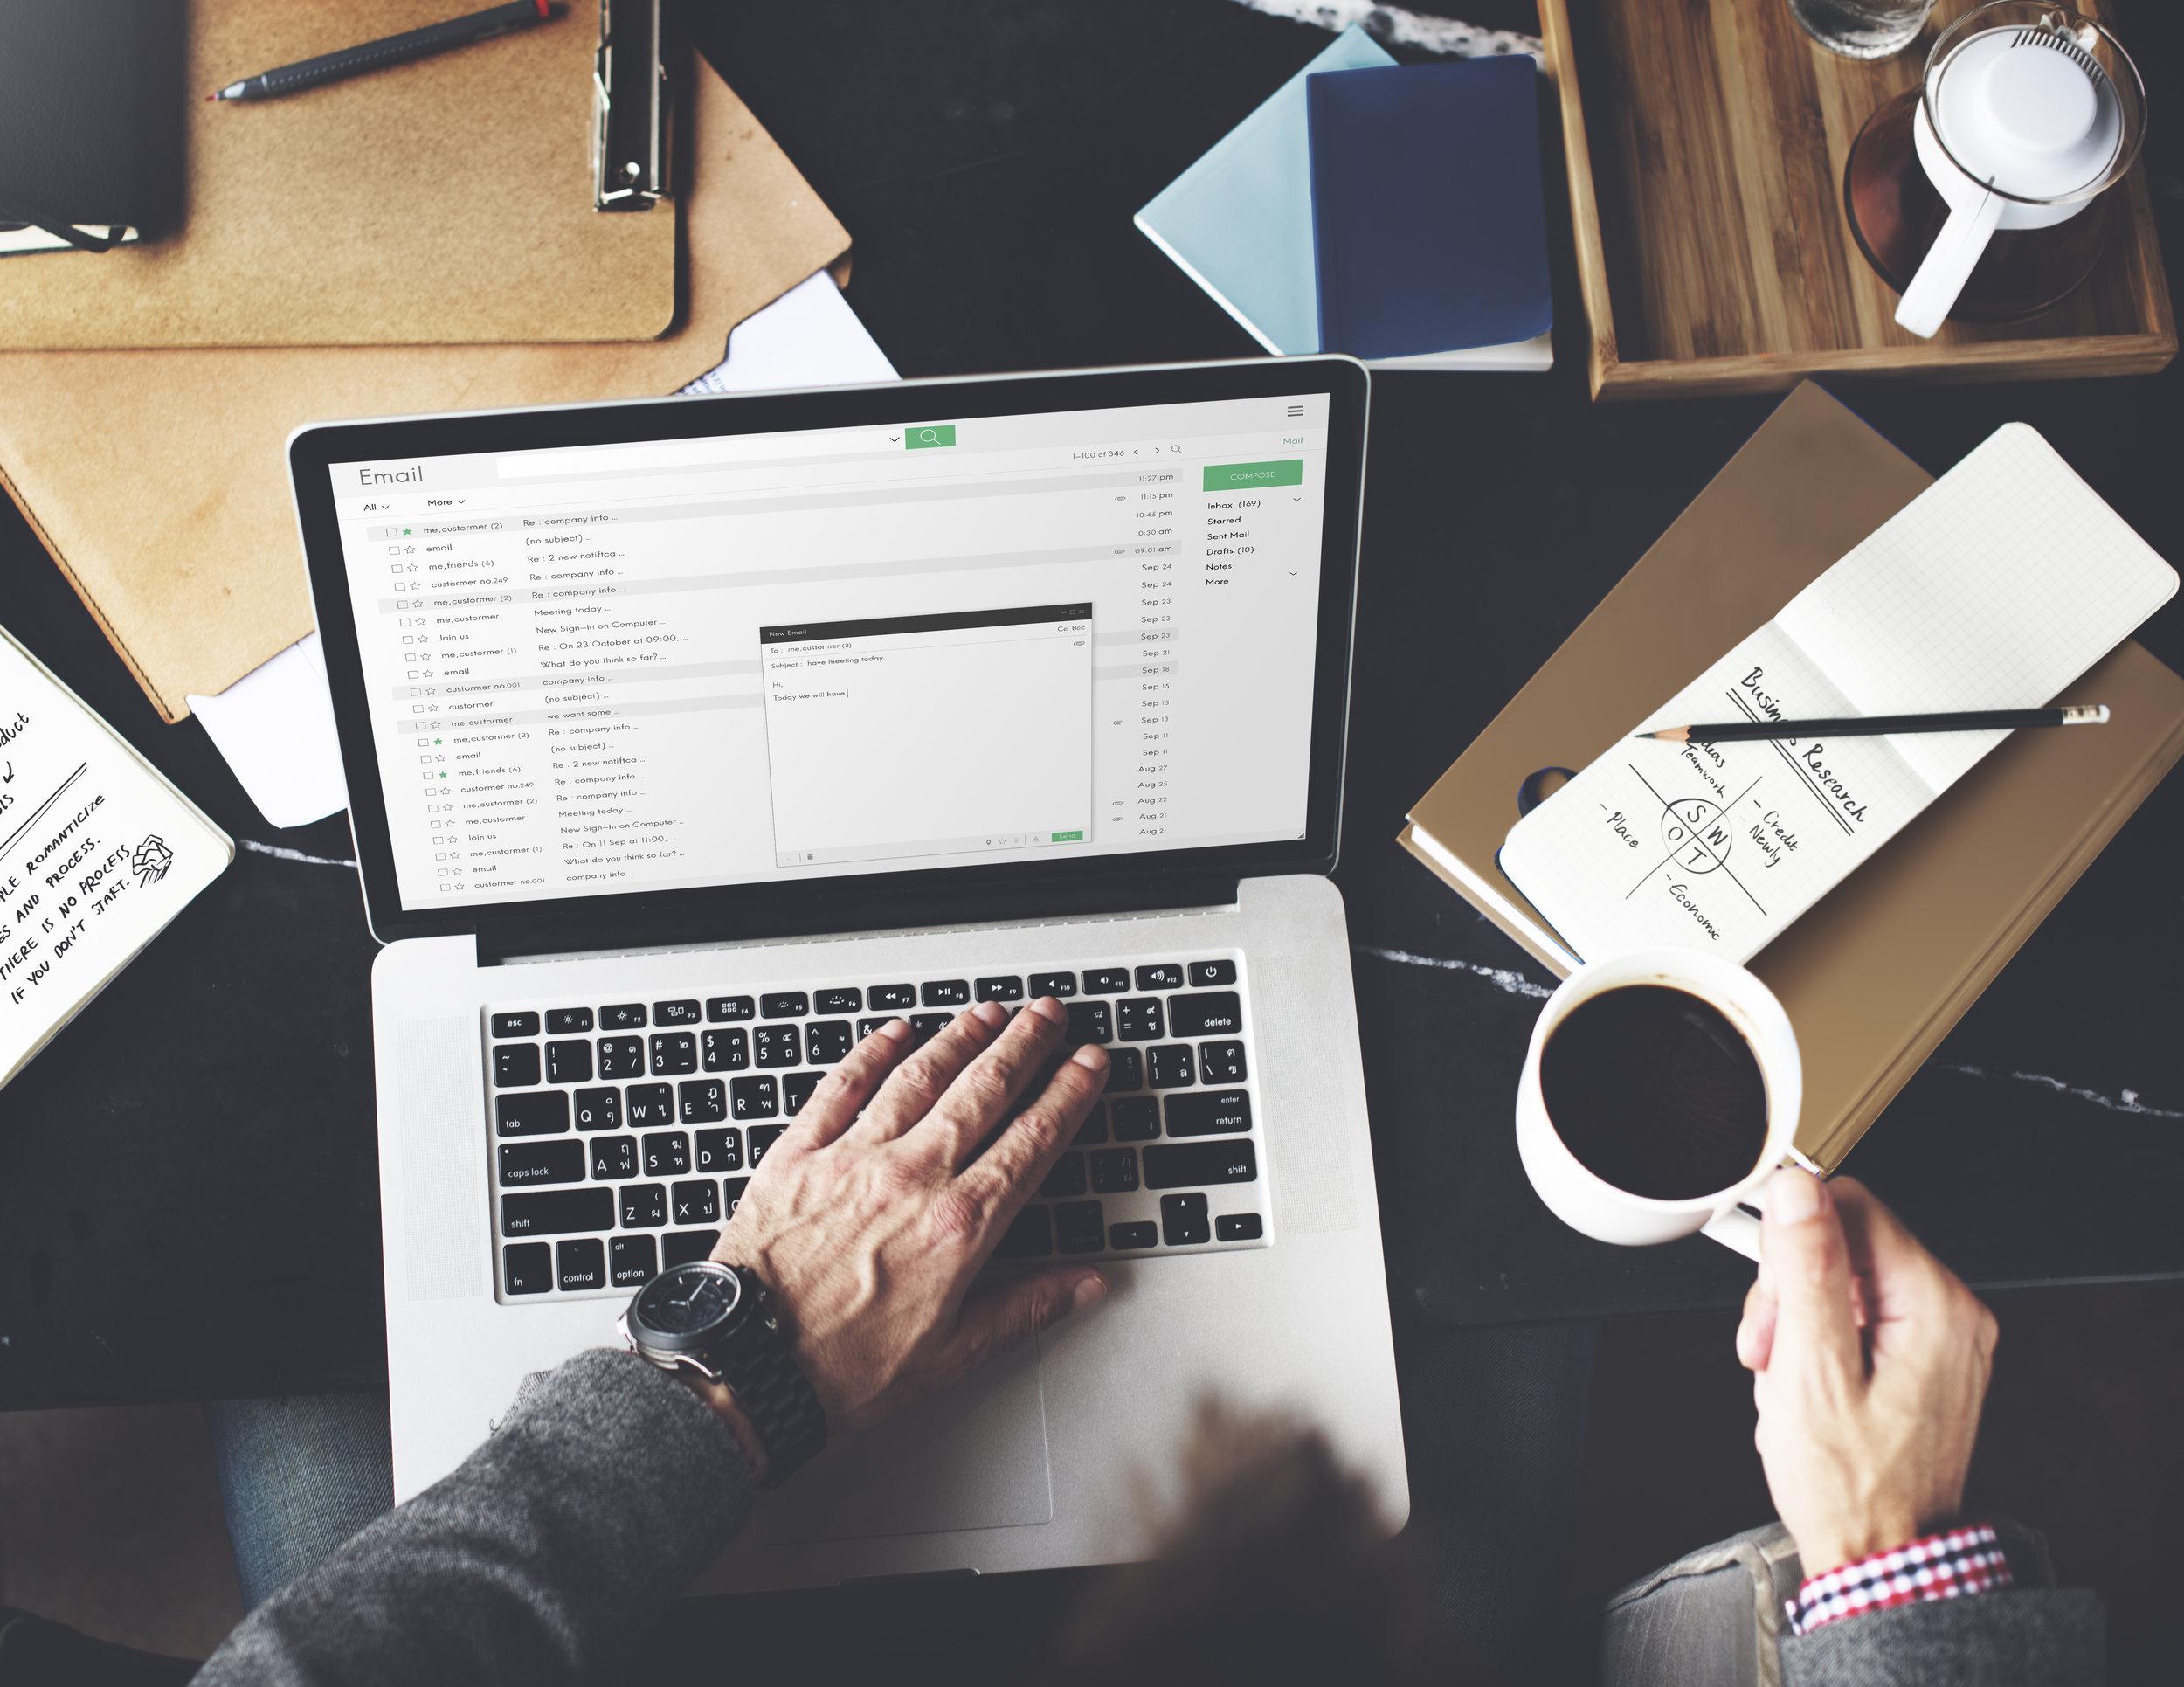 edit your emails - job applications